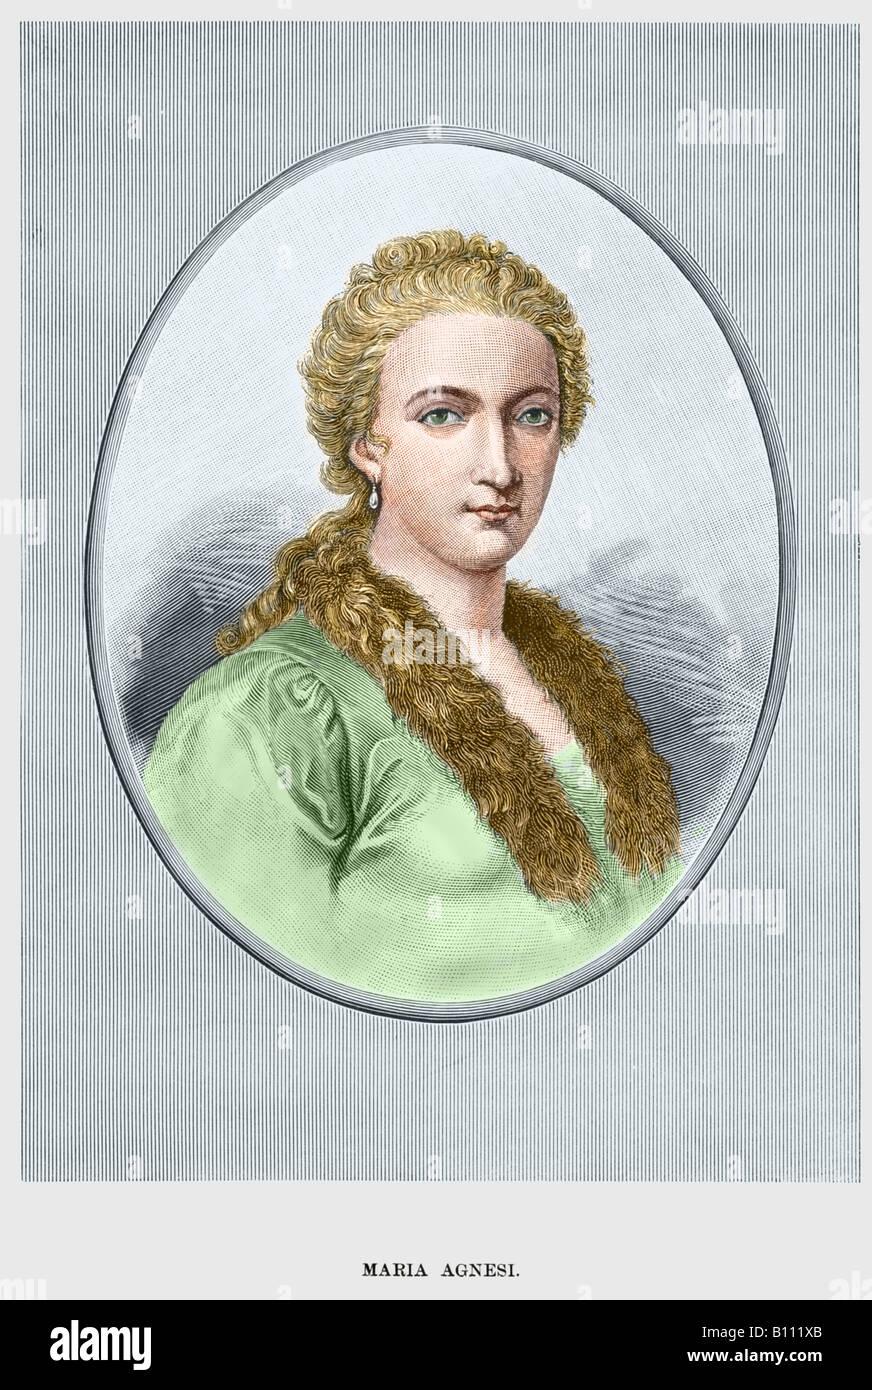 maria gaetana agnesi a renaissance mathematician Maria gaetana agnesi b 16 may 1718 d 9 january 1799 was an was a renaissance mathematician and astronomer who formulated the heliocentric model of the.